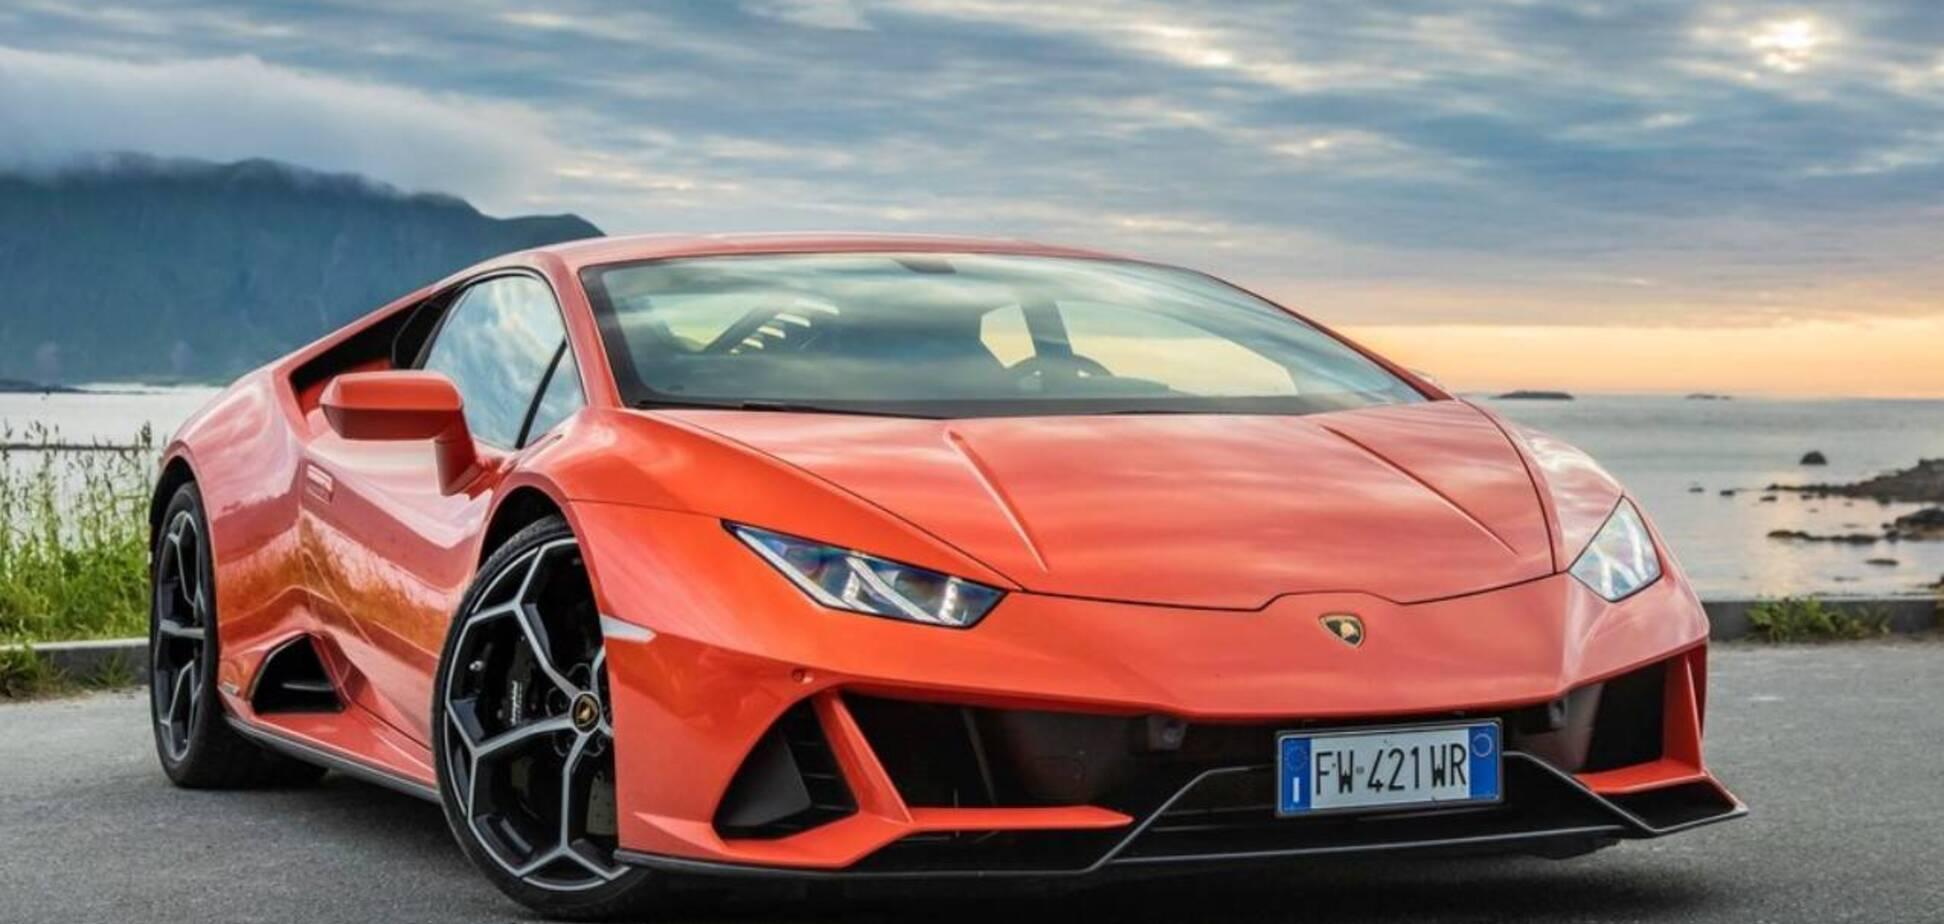 Американец купил суперкар на государственные деньги. Фото: Lamborghini